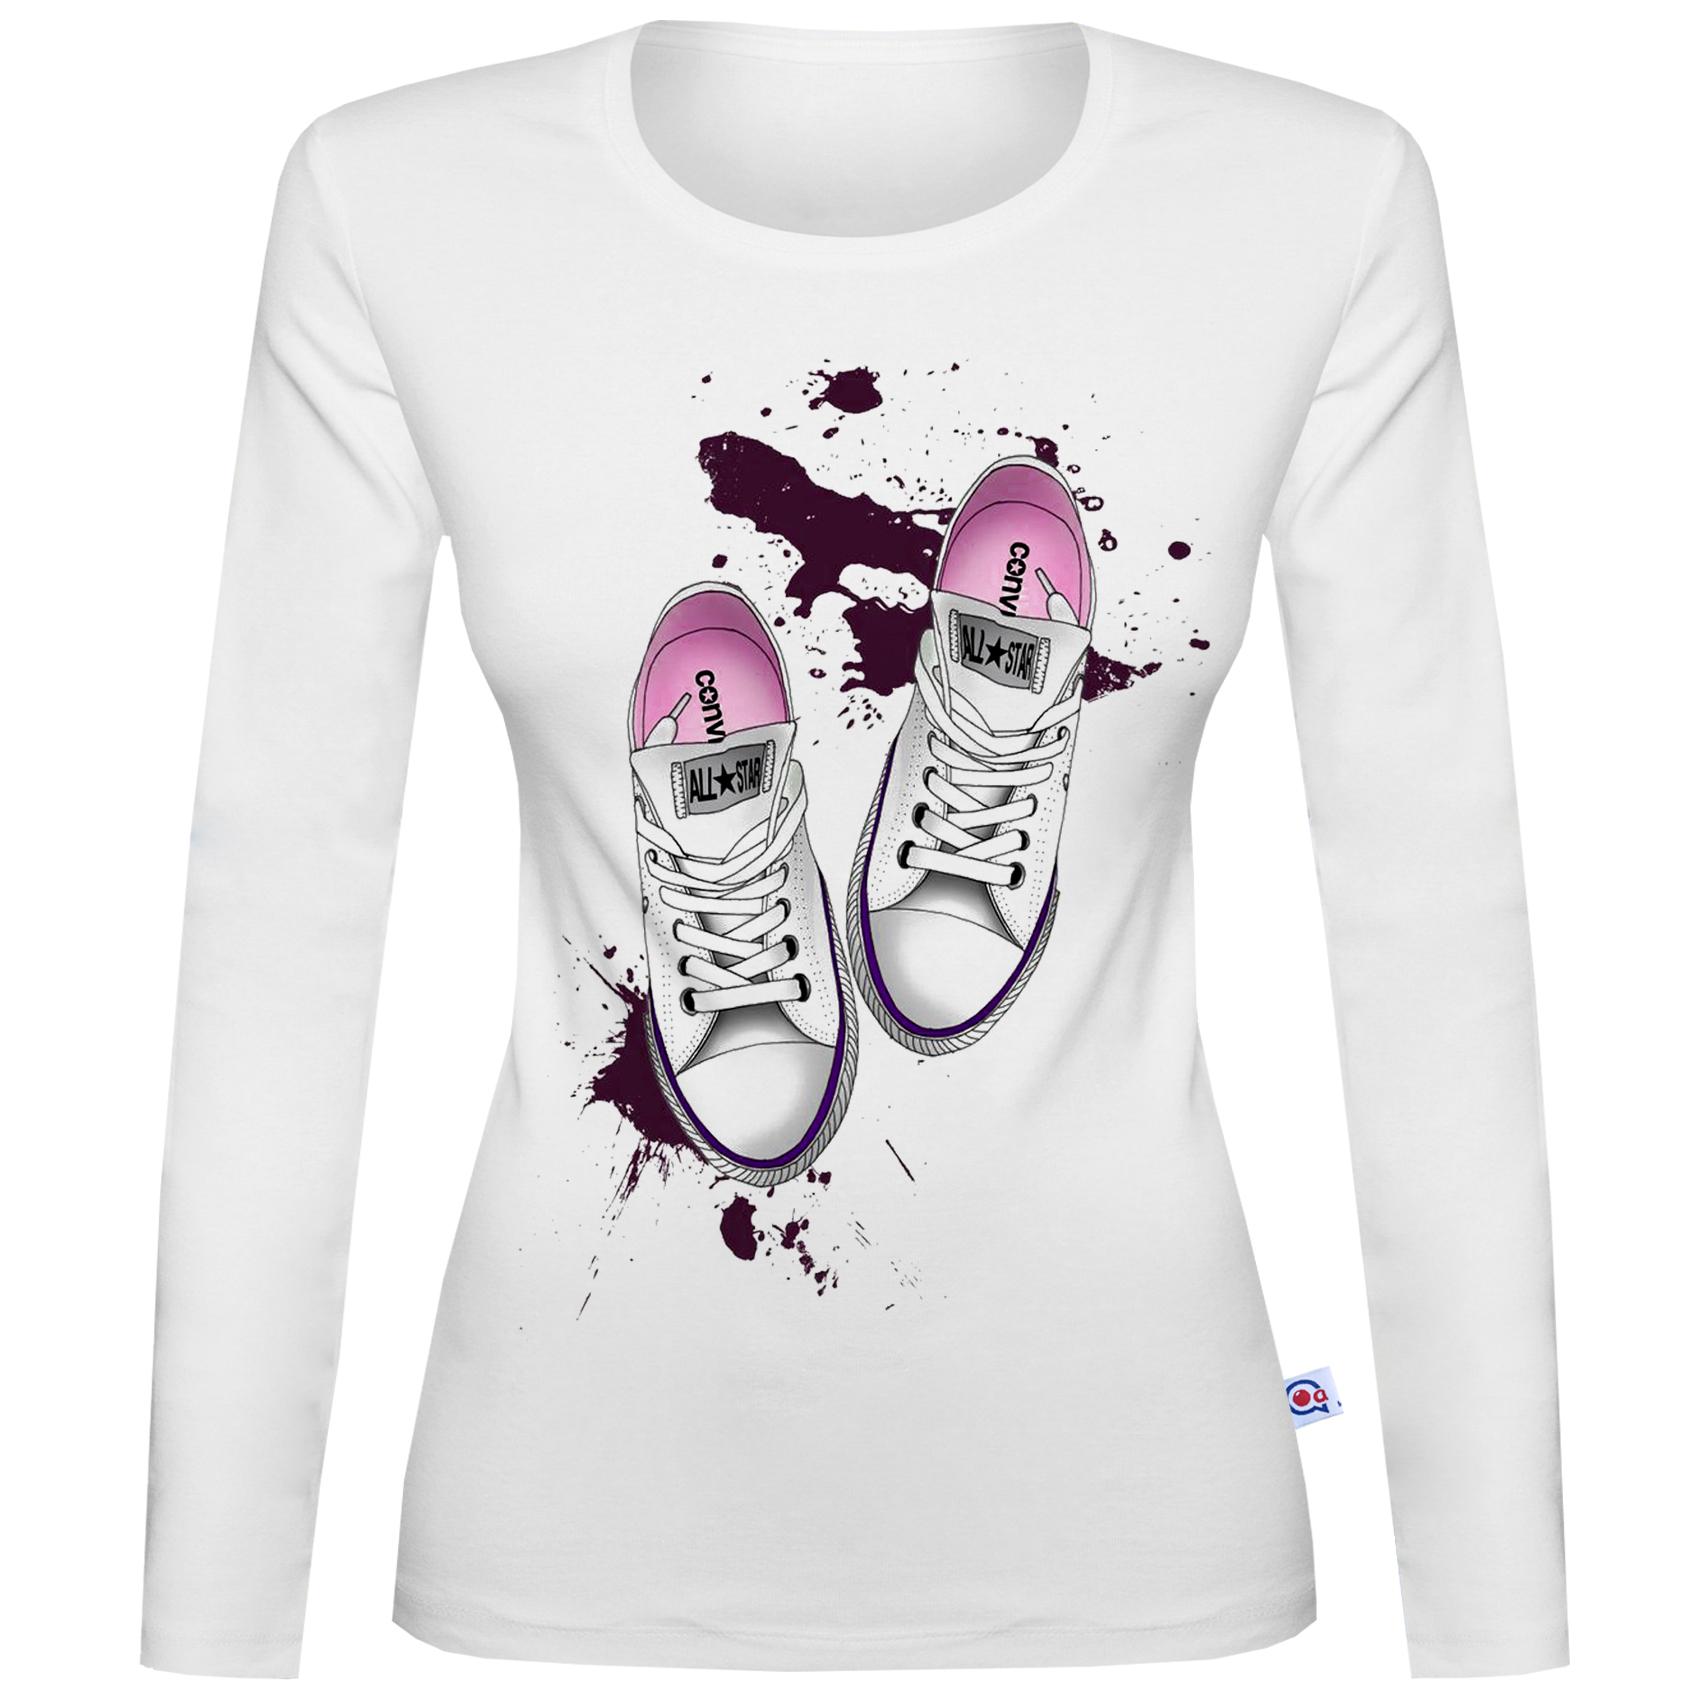 تی شرت  آستین بلند زنانه آکو طرح کتونی کد BS17